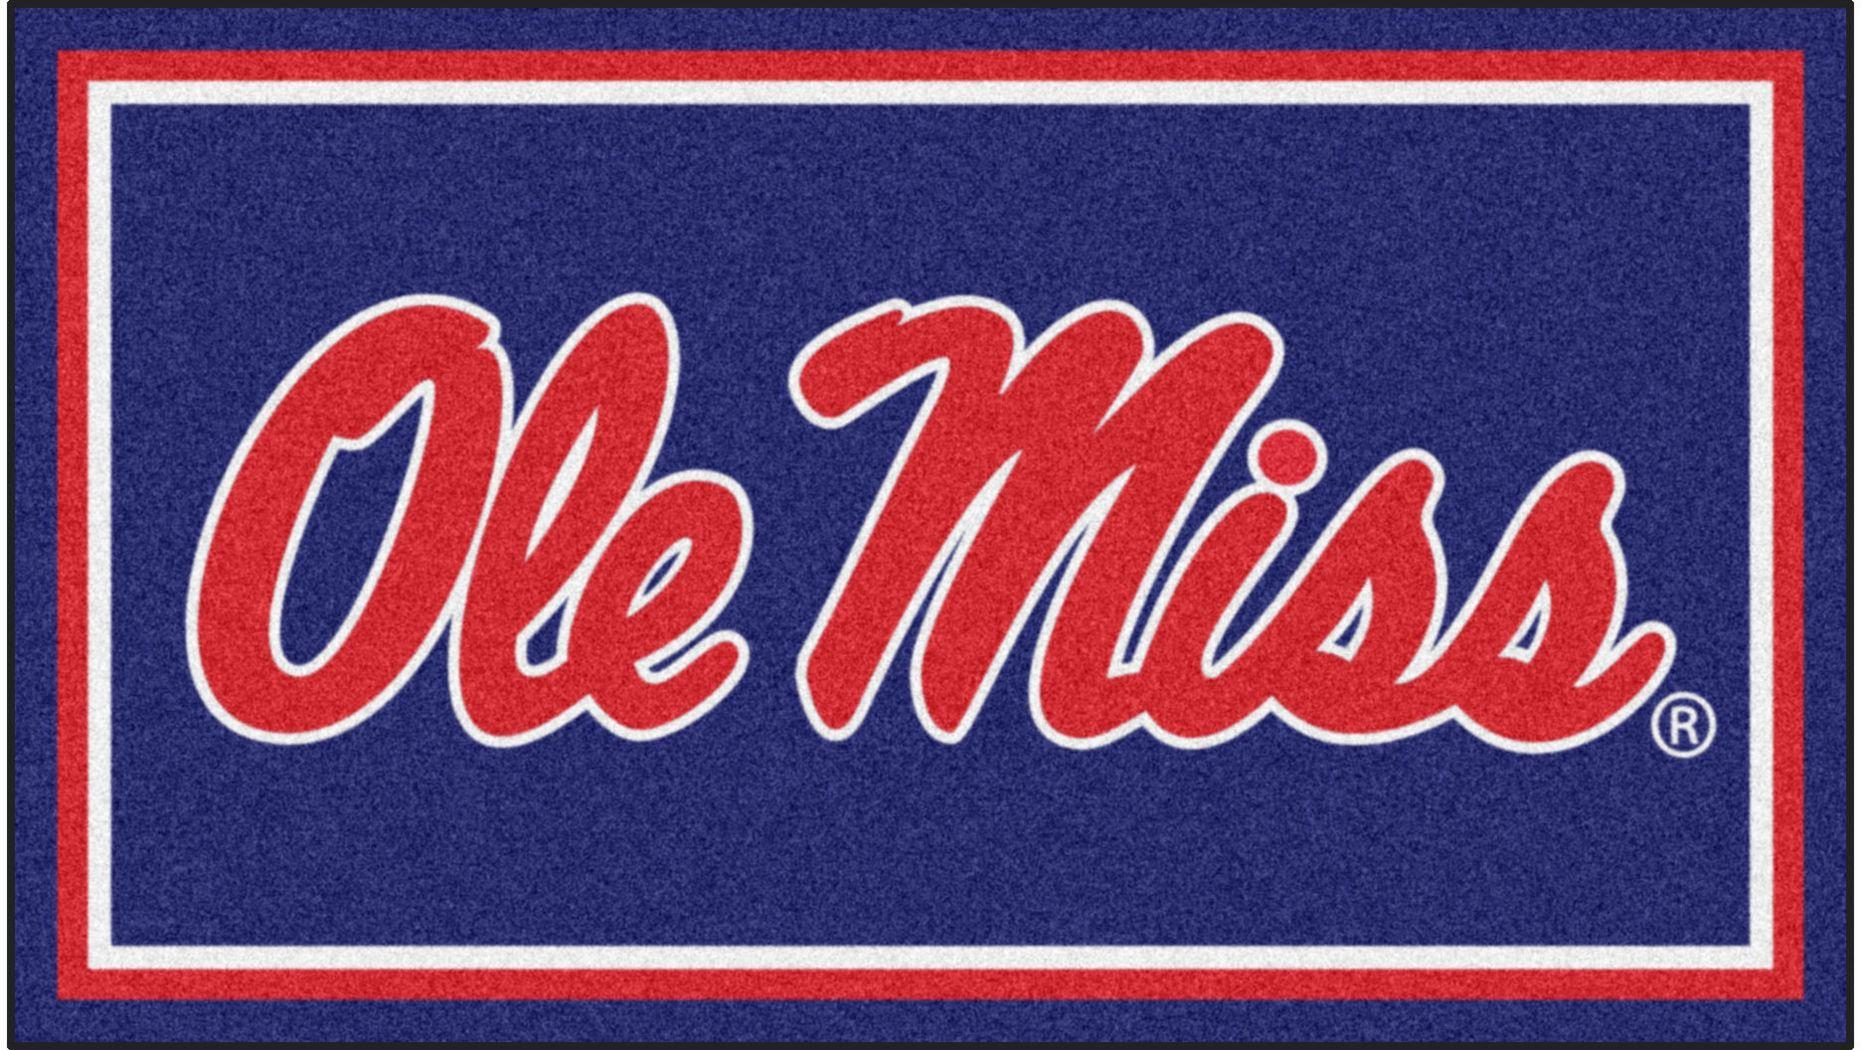 NCAA Big Game University of Mississippi 3' x 5' Rug